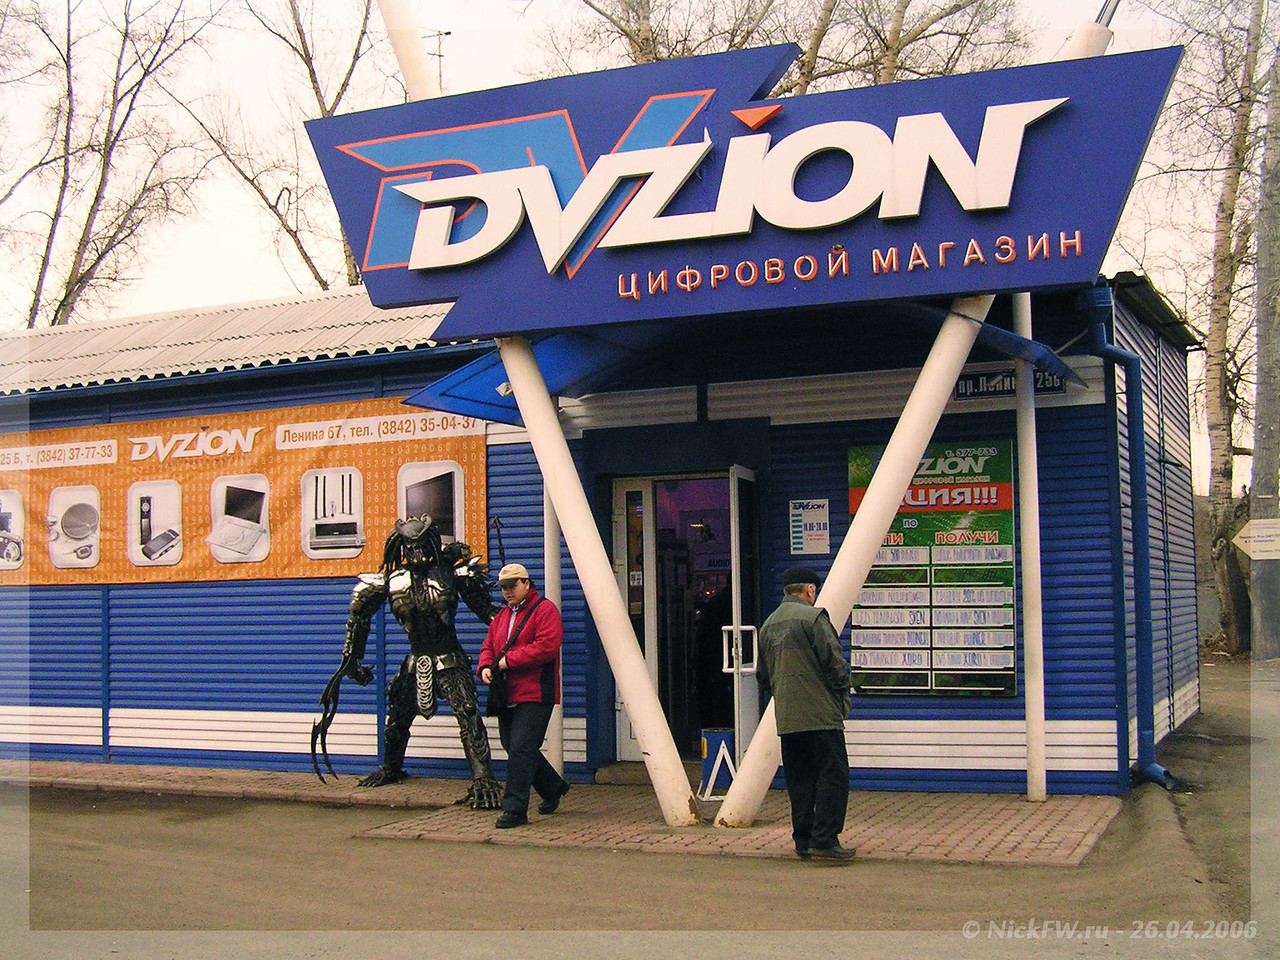 Скульптура Хищник возле магазина DVZION (© NickFW - 26.04.2006)